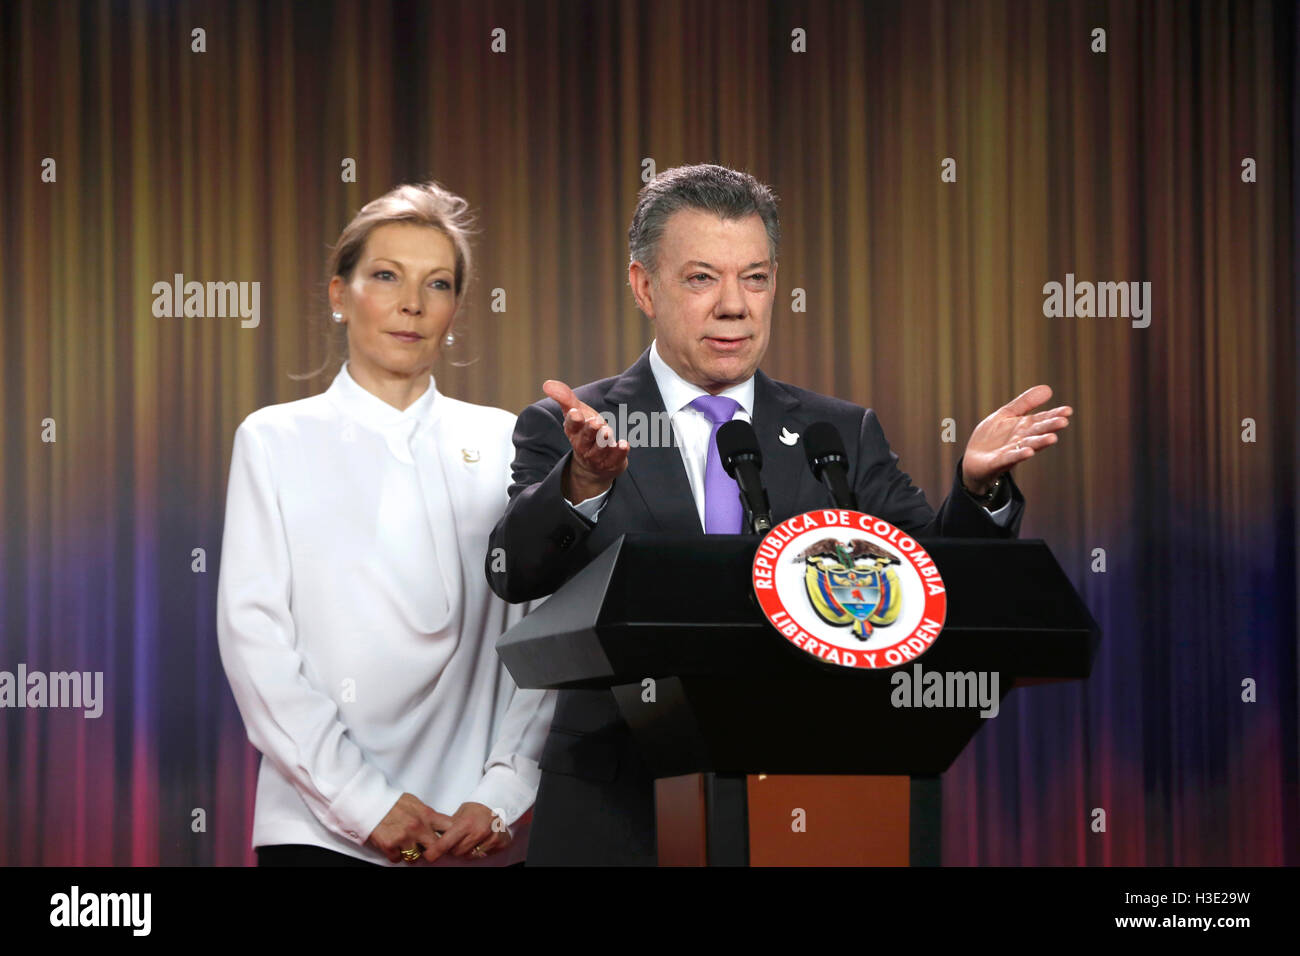 Bogota, Kolumbien. 7. Oktober 2016. Colombian President Juan Manuel Santos (R) liefert eine Erklärung nach Stockbild